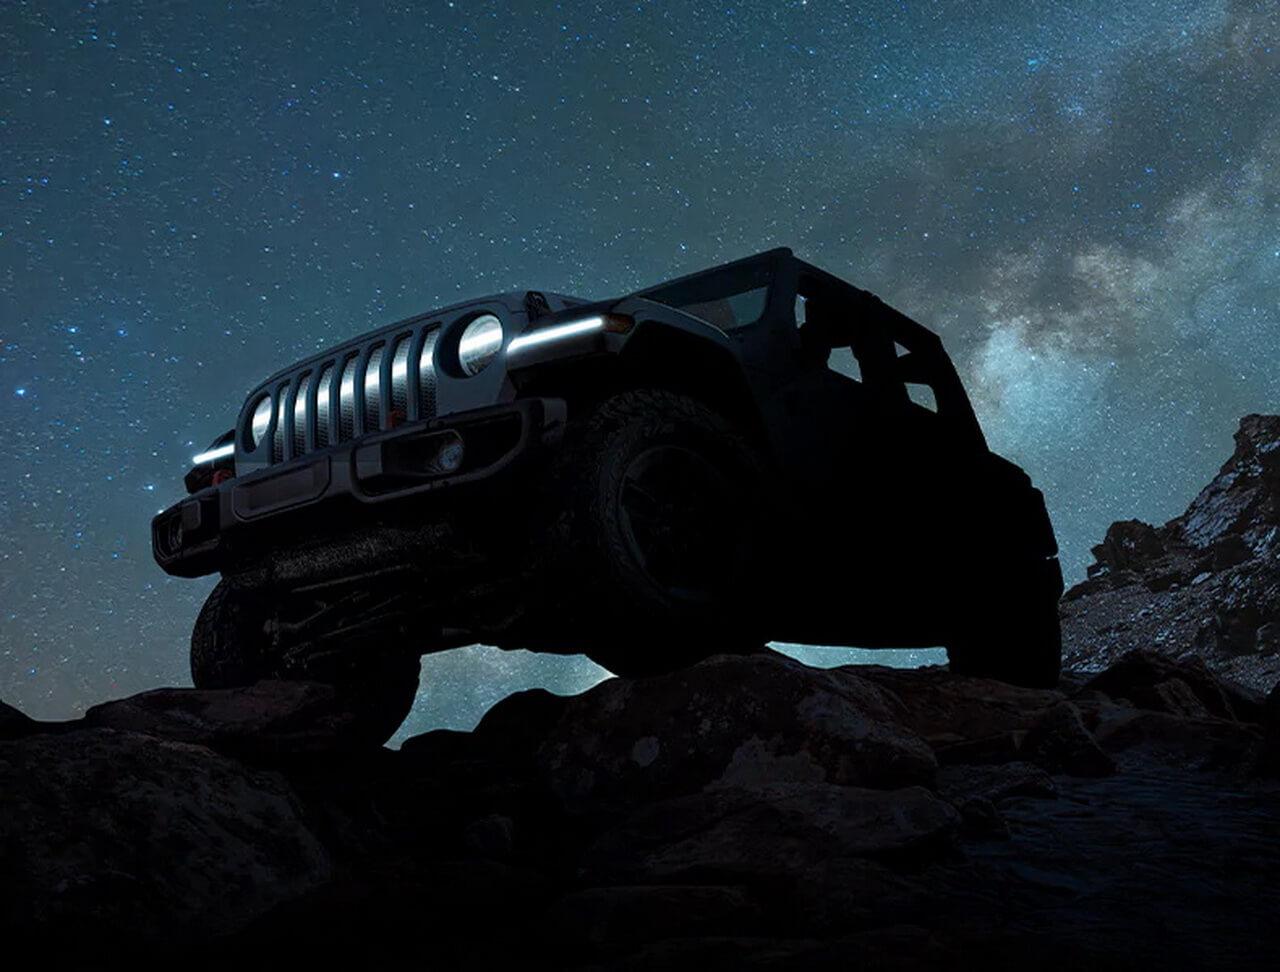 Jeep представляет тизер концепта электрического Wrangler